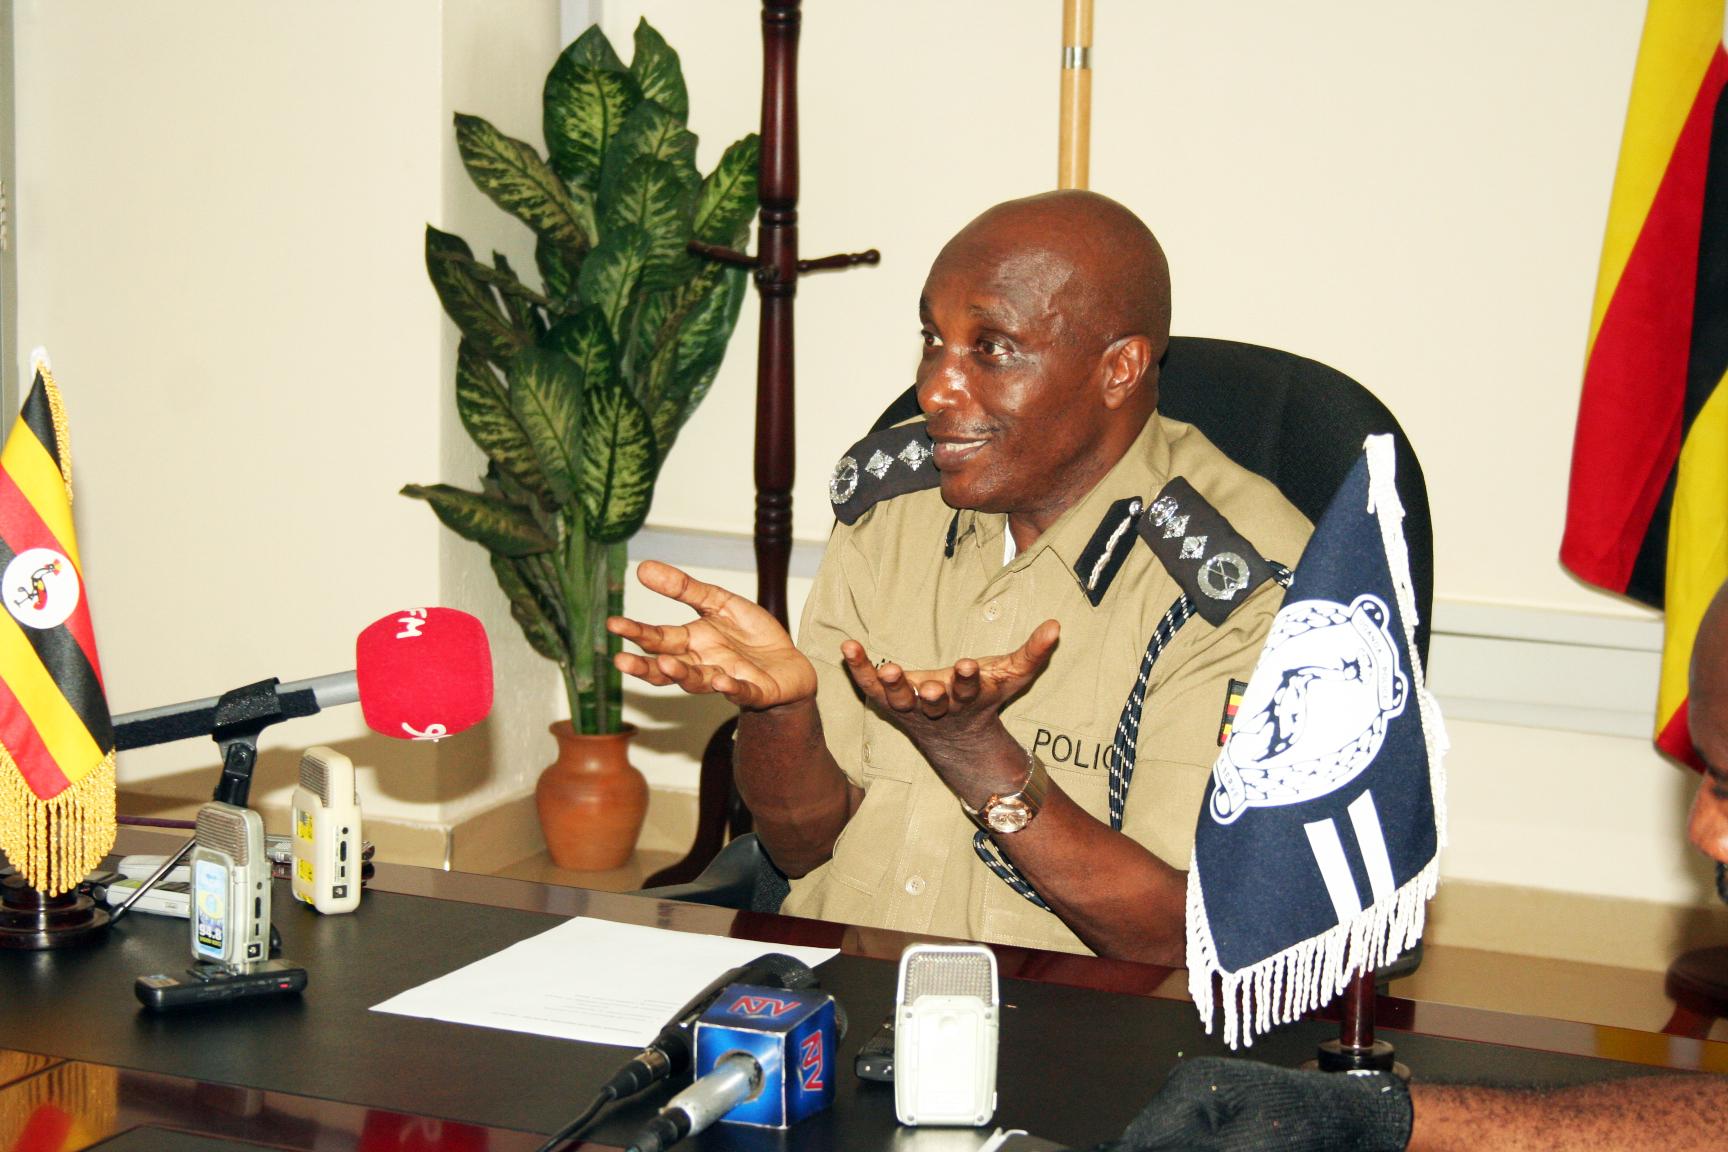 Police Chief Gen. Kale Kayhura